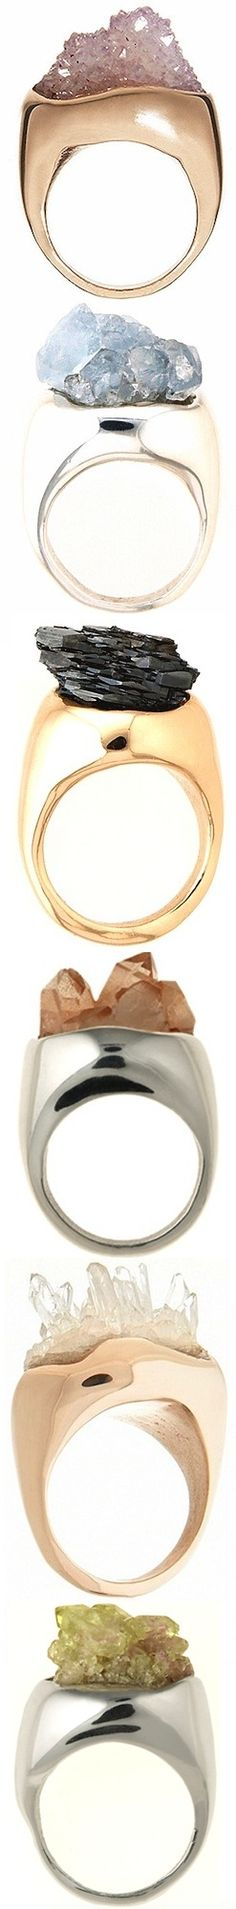 Cosa Fina raw crystal rings: amethyst, celestite, hematite, gold topaz, quartz, vesuvianite